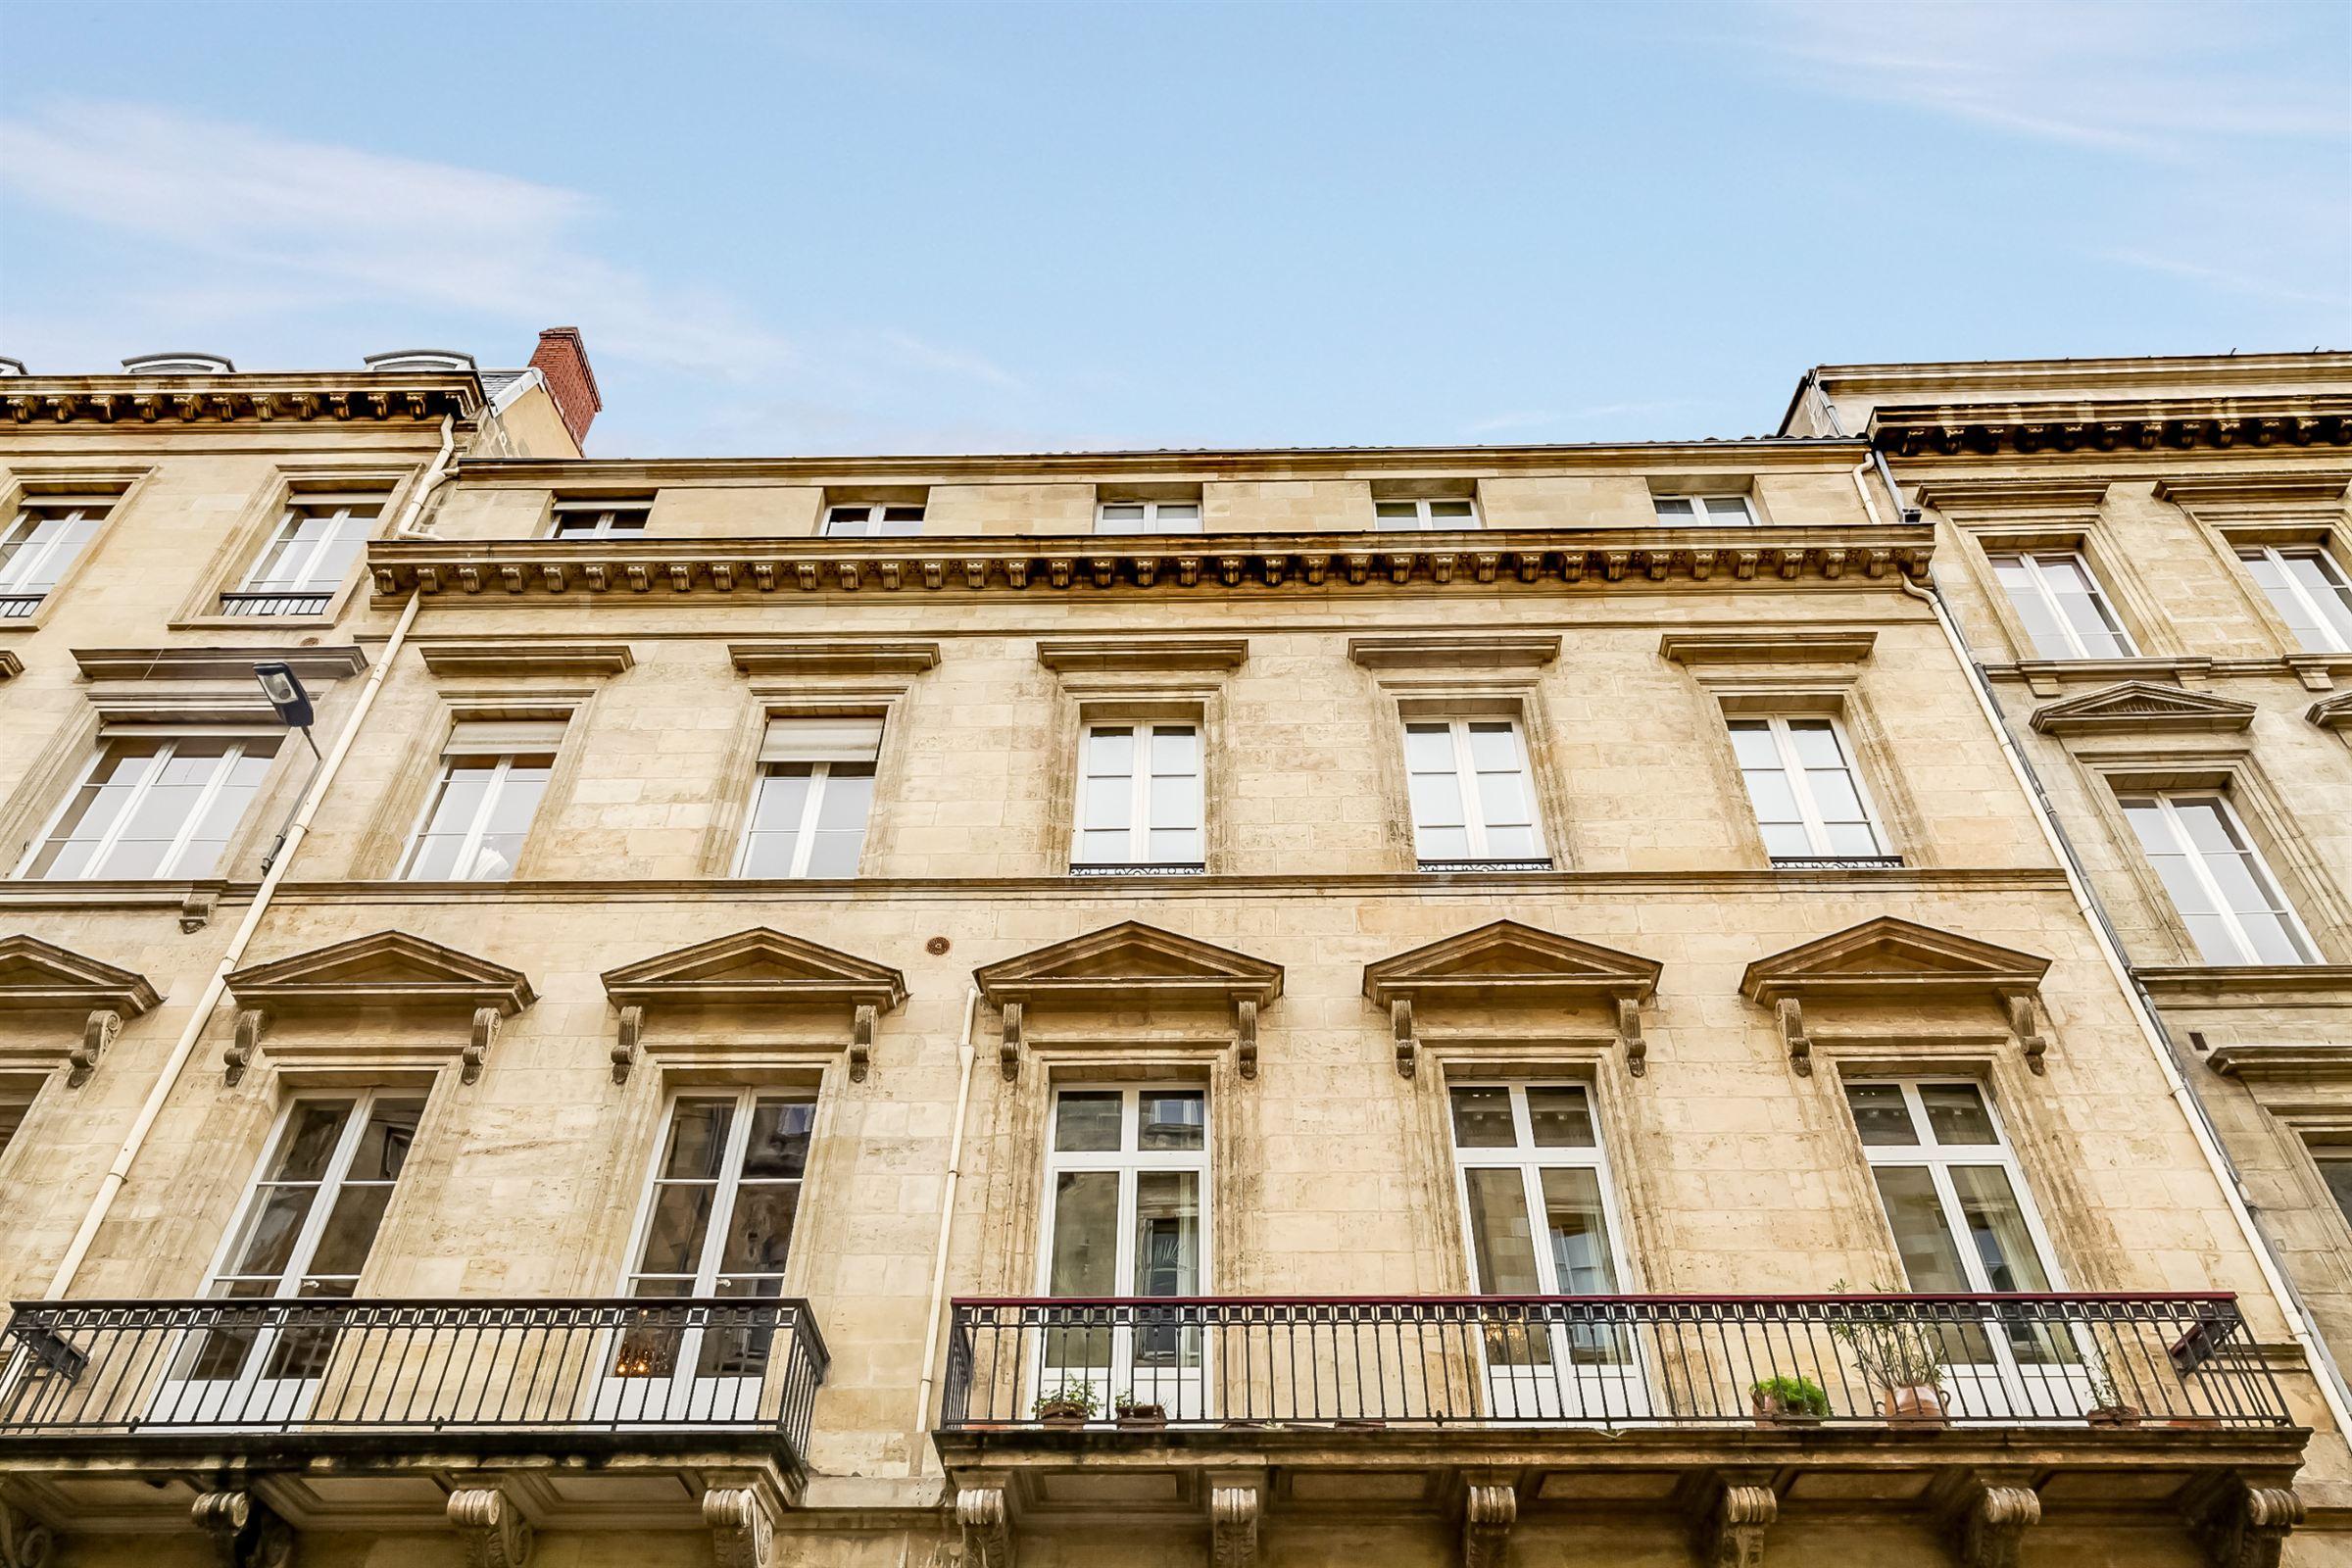 Apartment for Sale at BORDEAUX DOWNTOWN - RARE 18TH CENTURY APARTMENT WITH INDEPENDENT STUDIO Bordeaux, Aquitaine, 33000 France